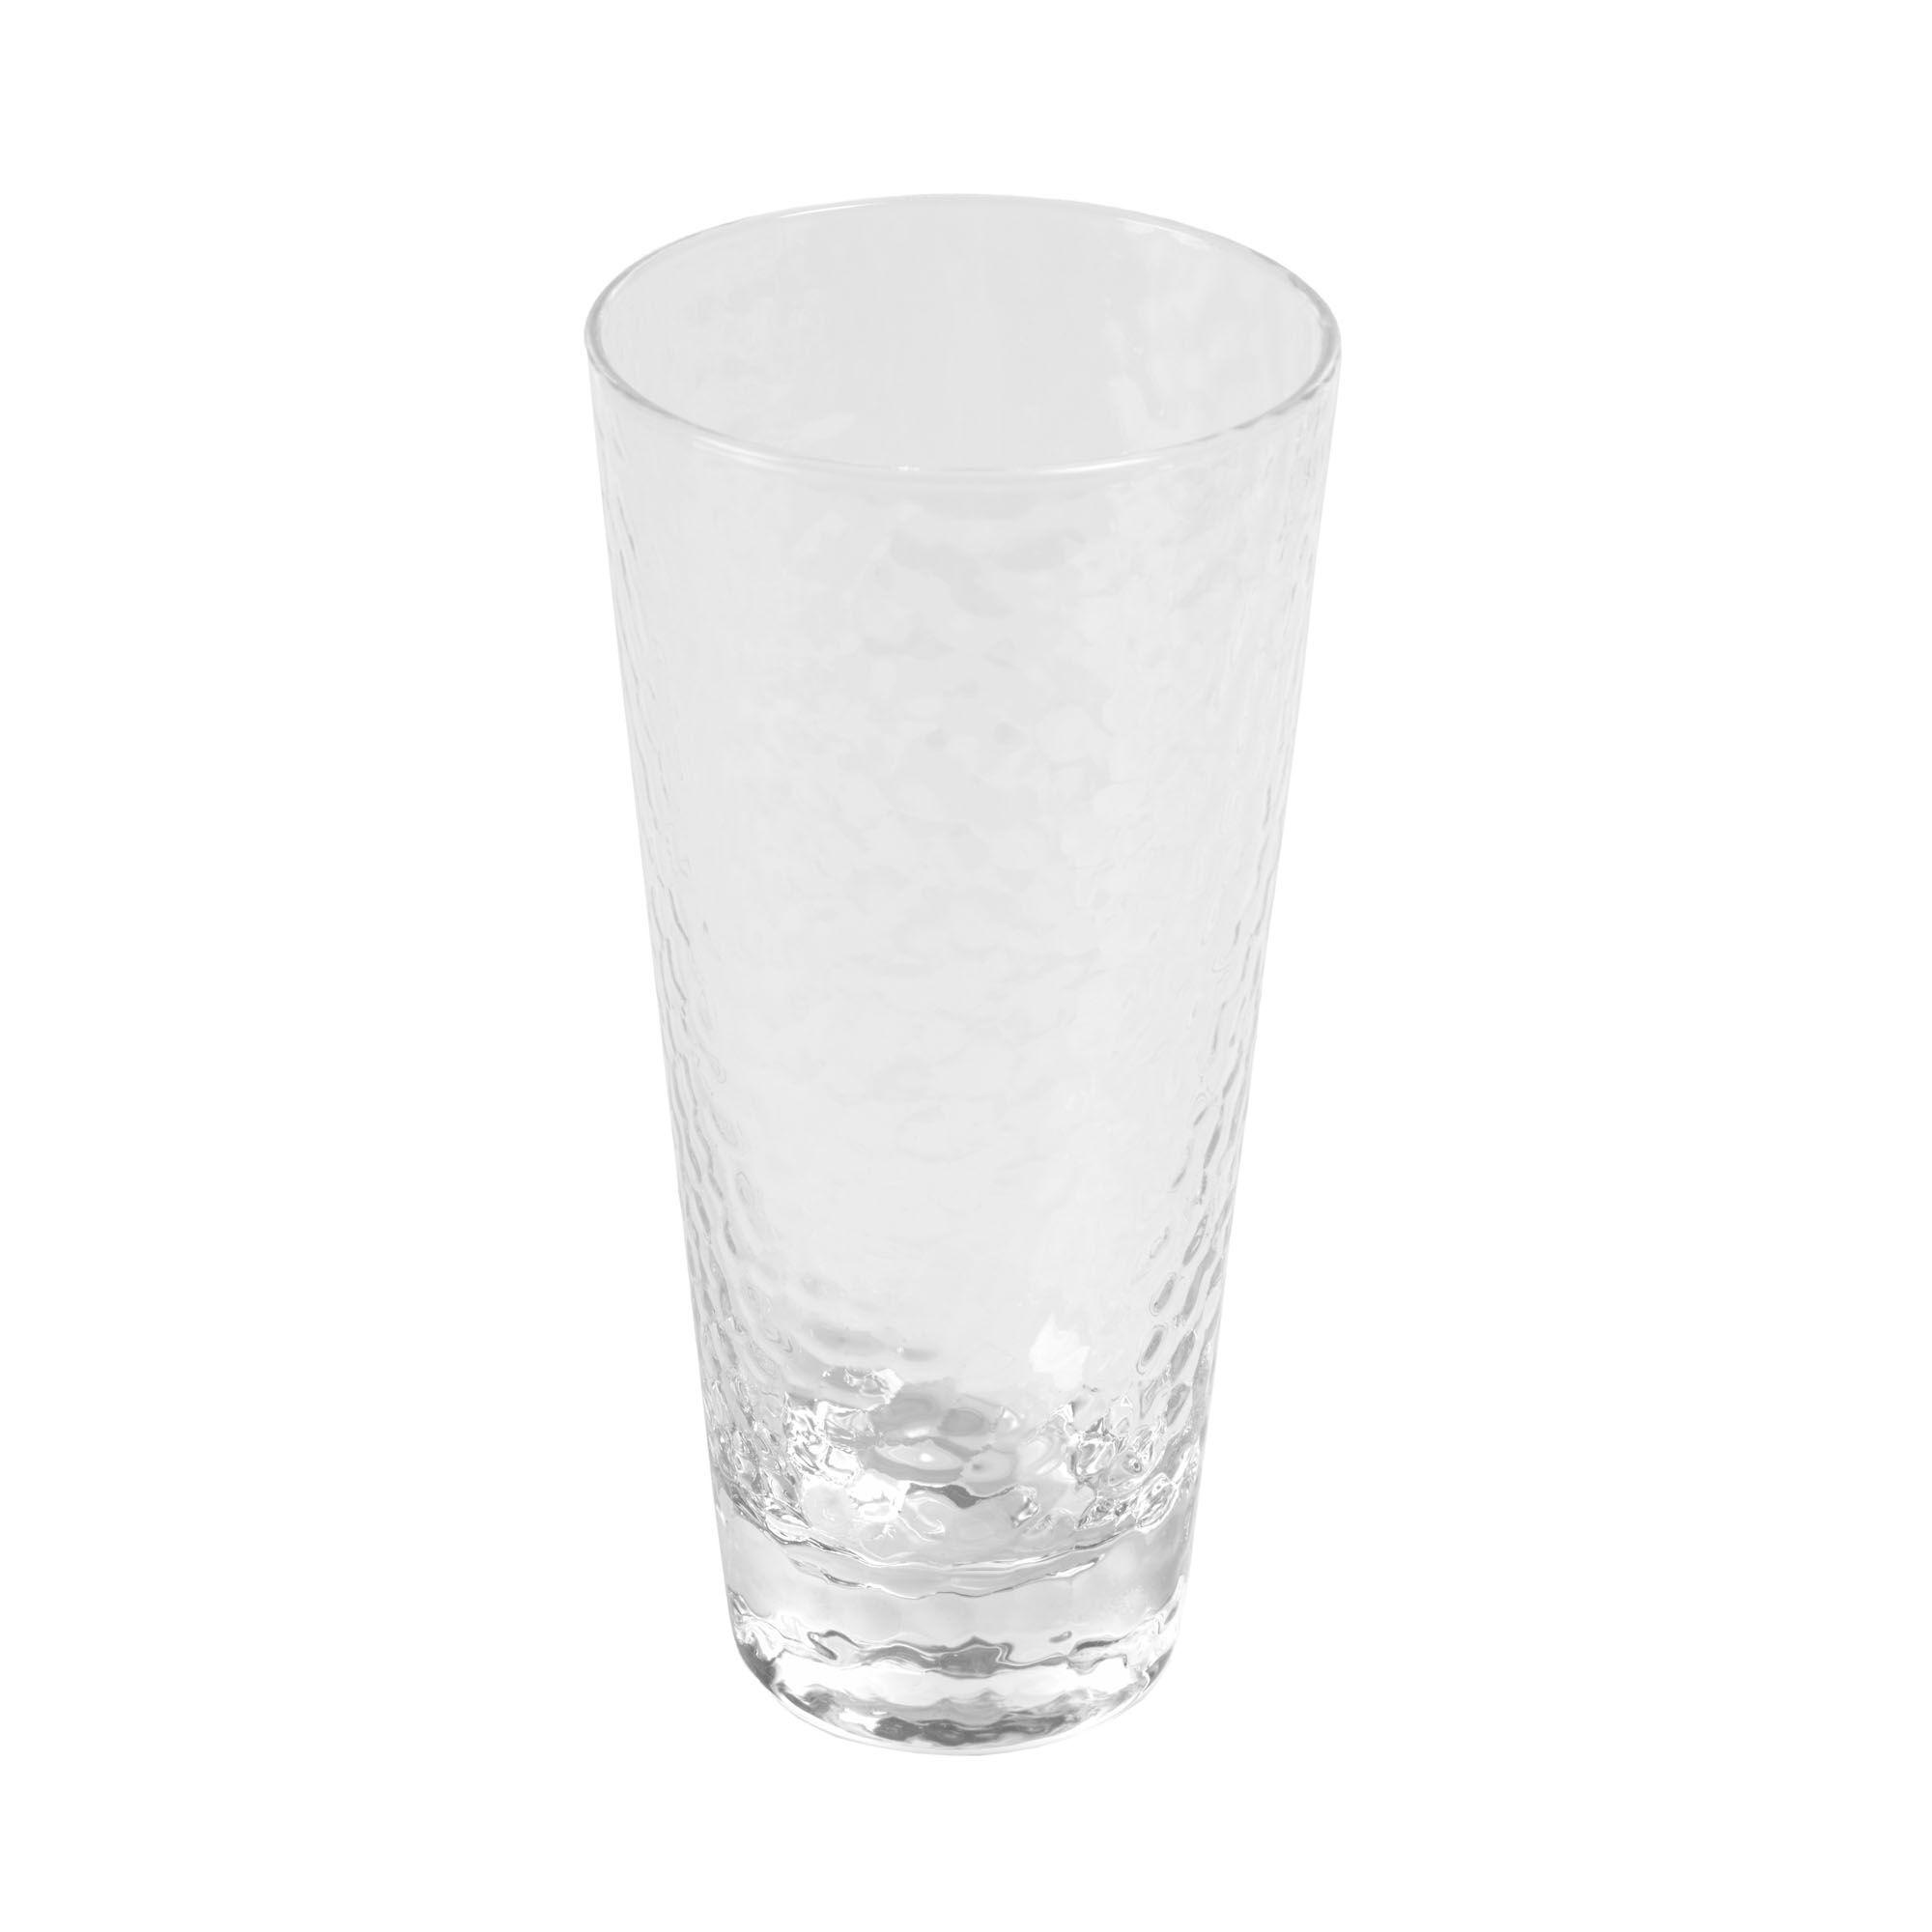 Kave Home - Dinna großes, transparentes und graues Glas